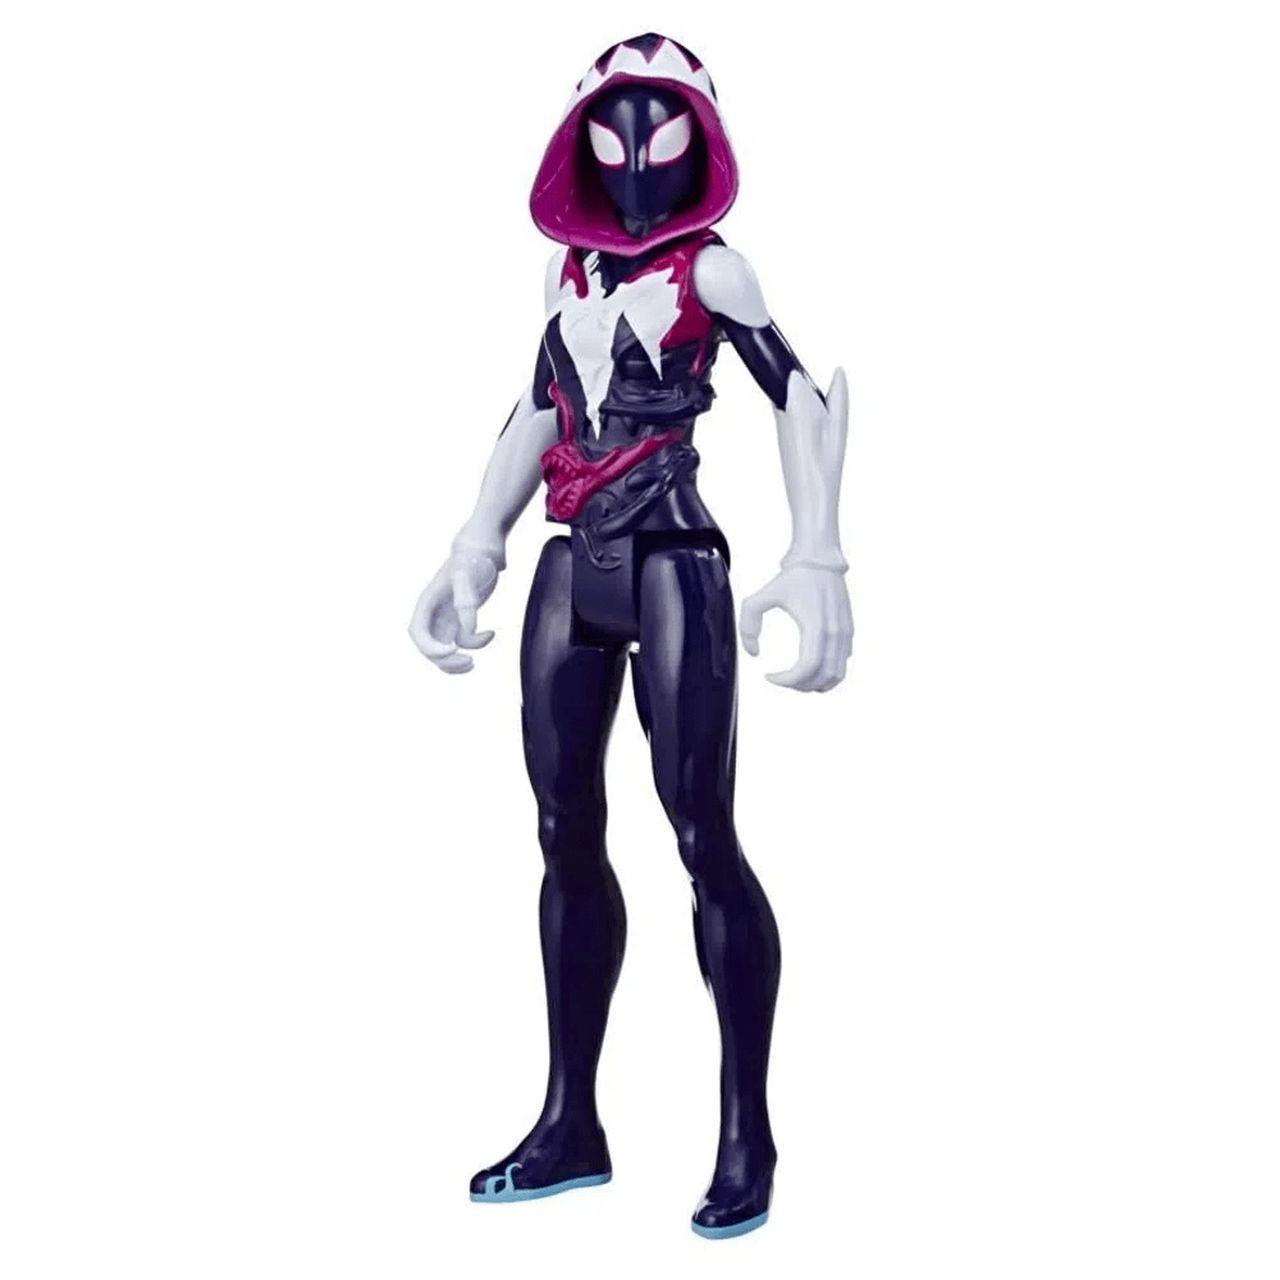 Boneco Gwen Ghost - Spider Venom Blast Gear 27cm - Hasbro